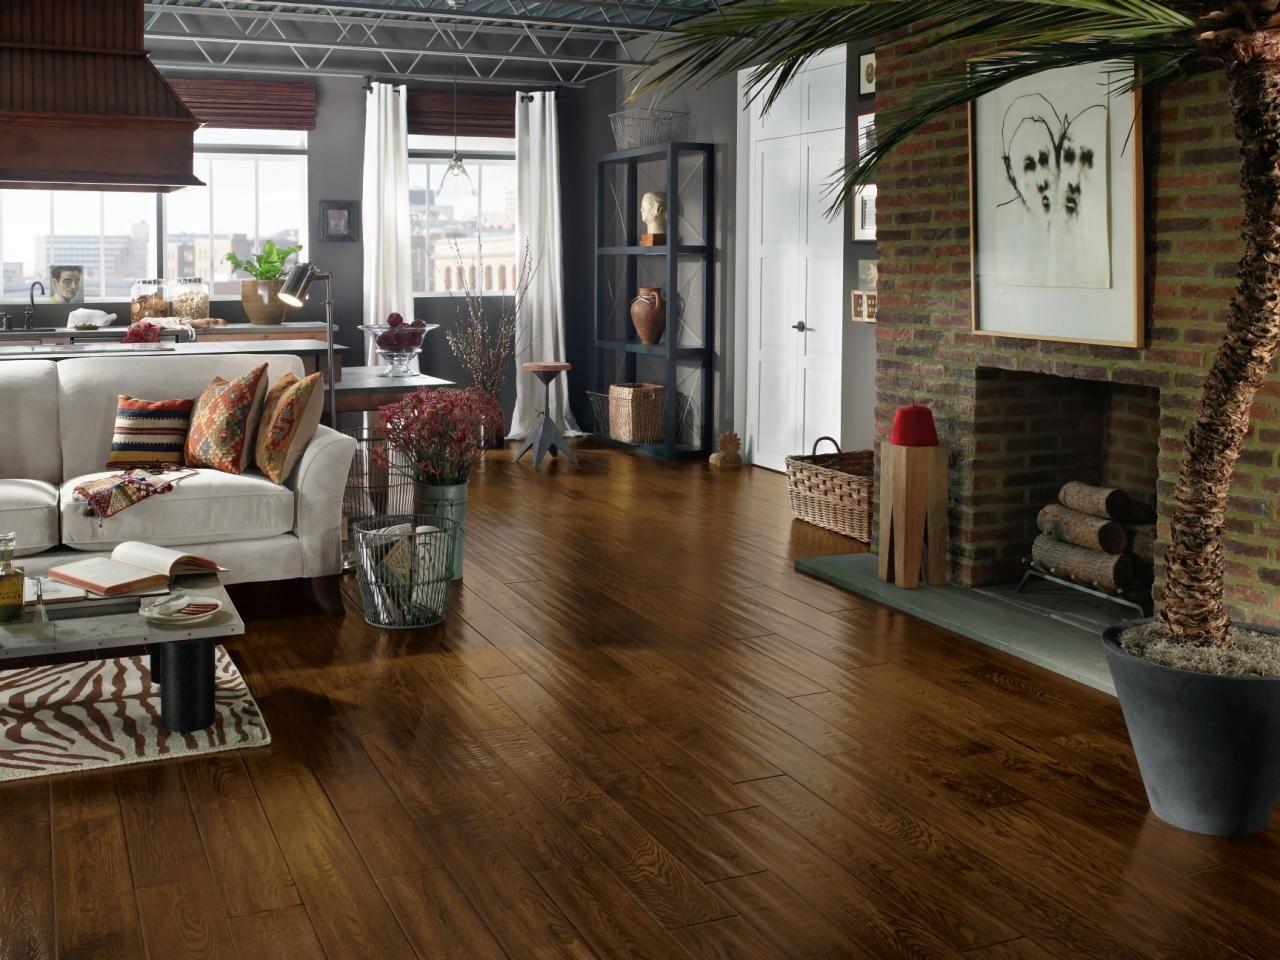 Choosing Hardwood Flooring